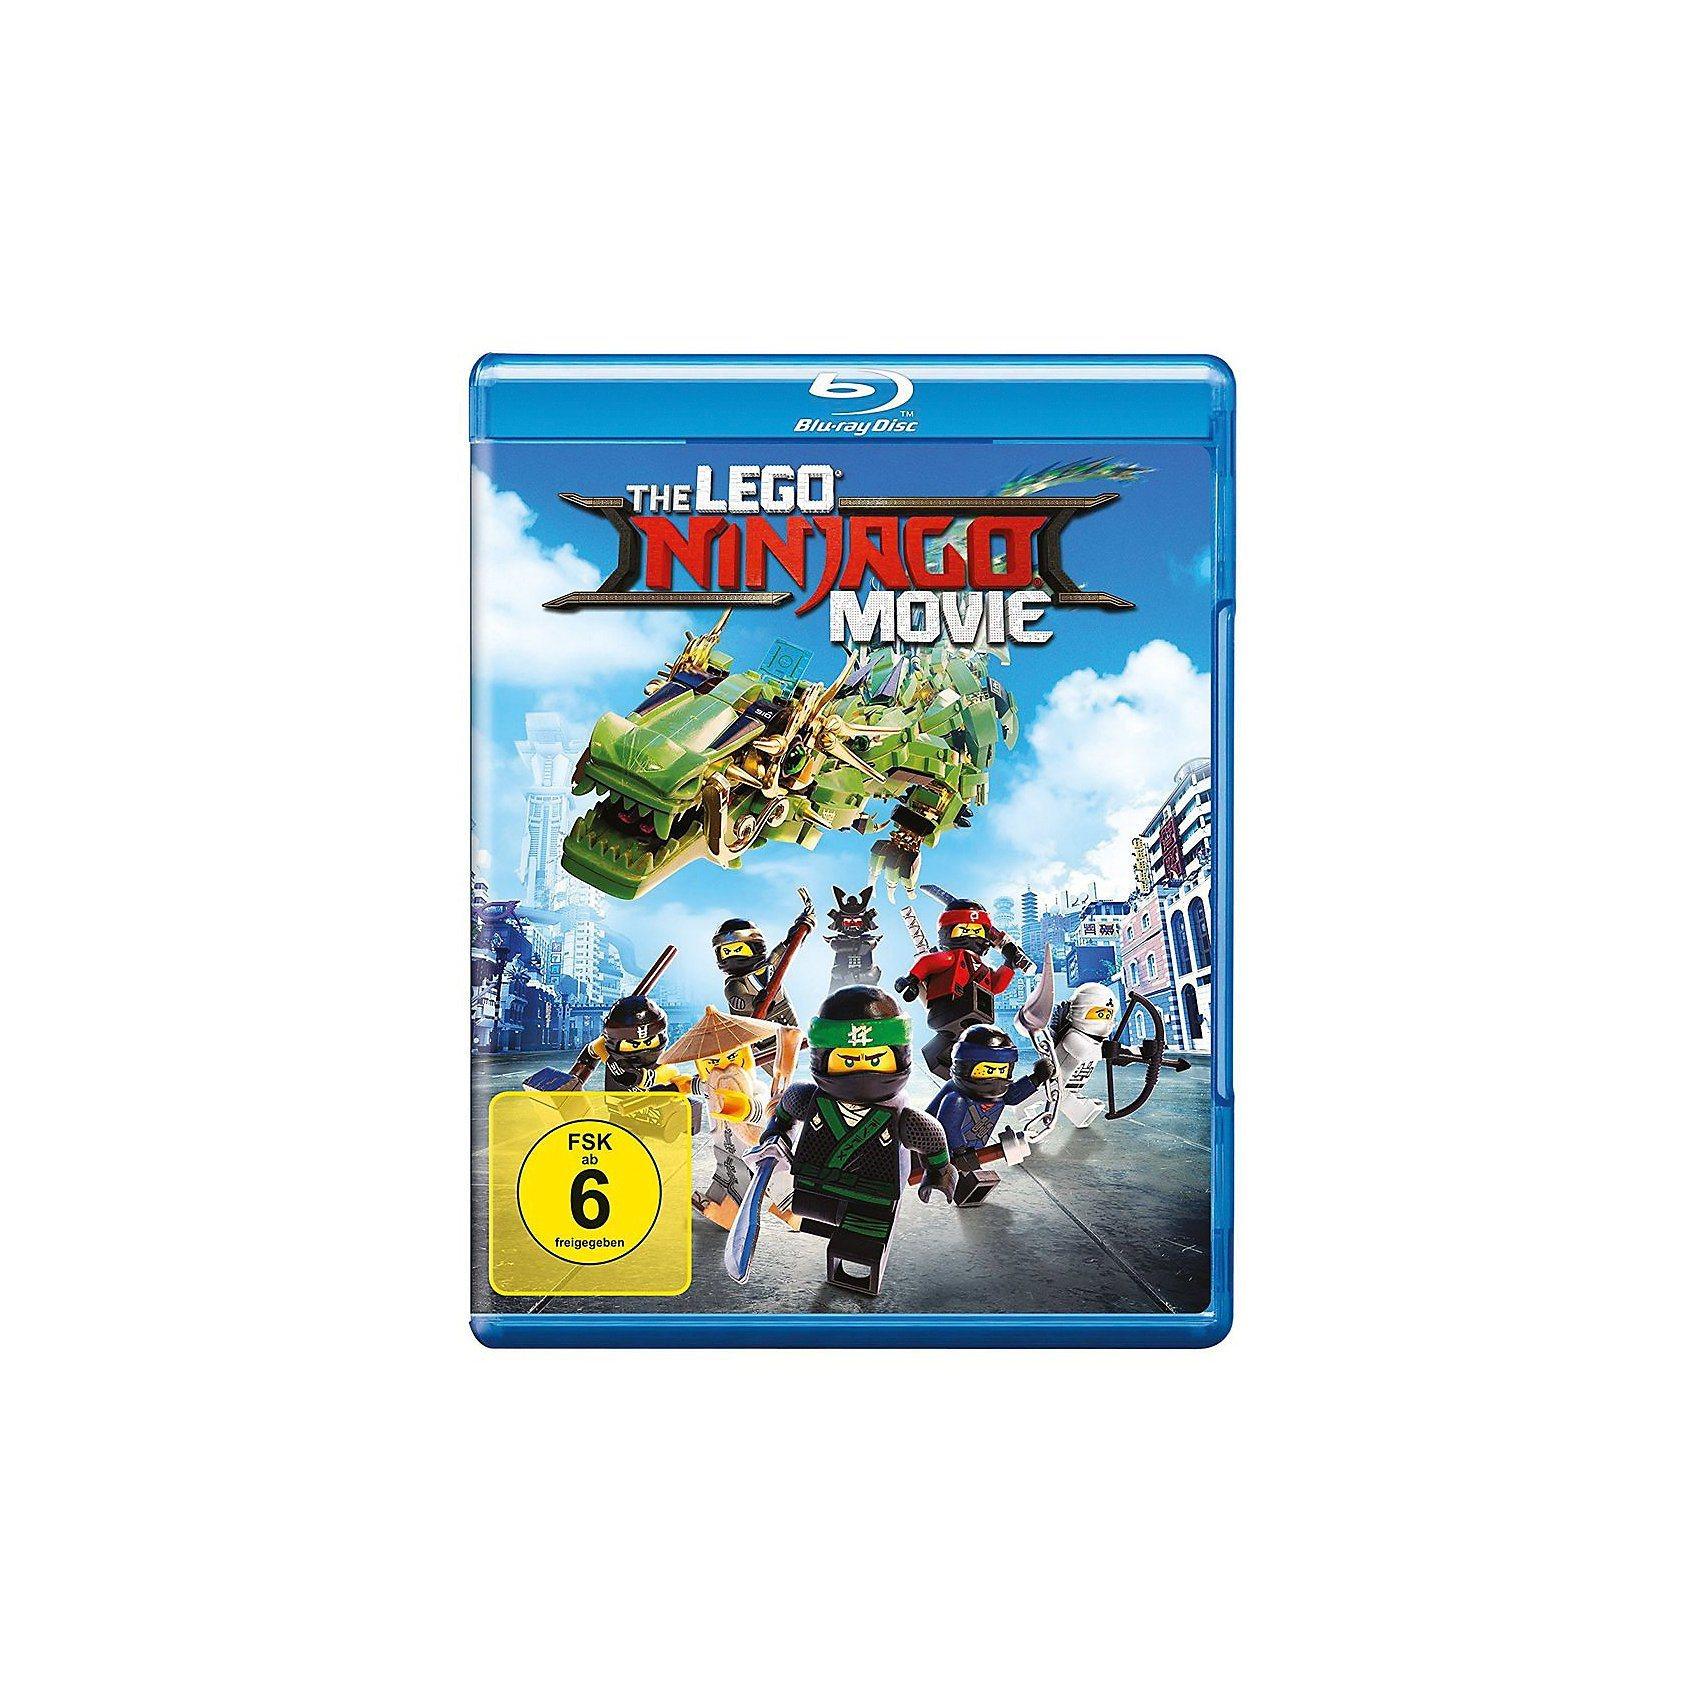 Feuertempel Ninjago Lego Preisvergleich • Die besten Angebote online ...